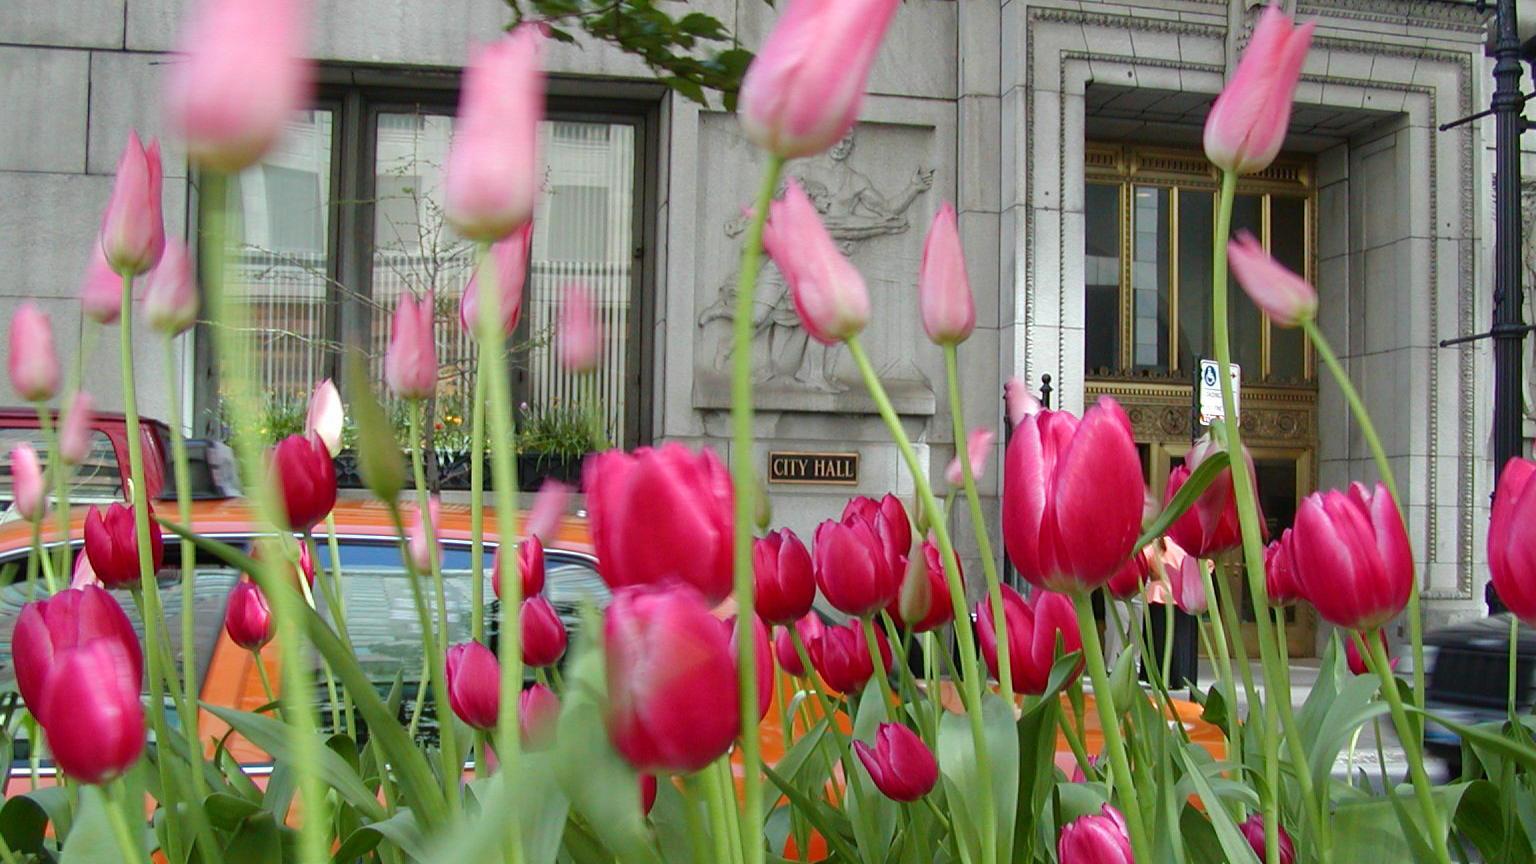 LaSalle Street at City Hall